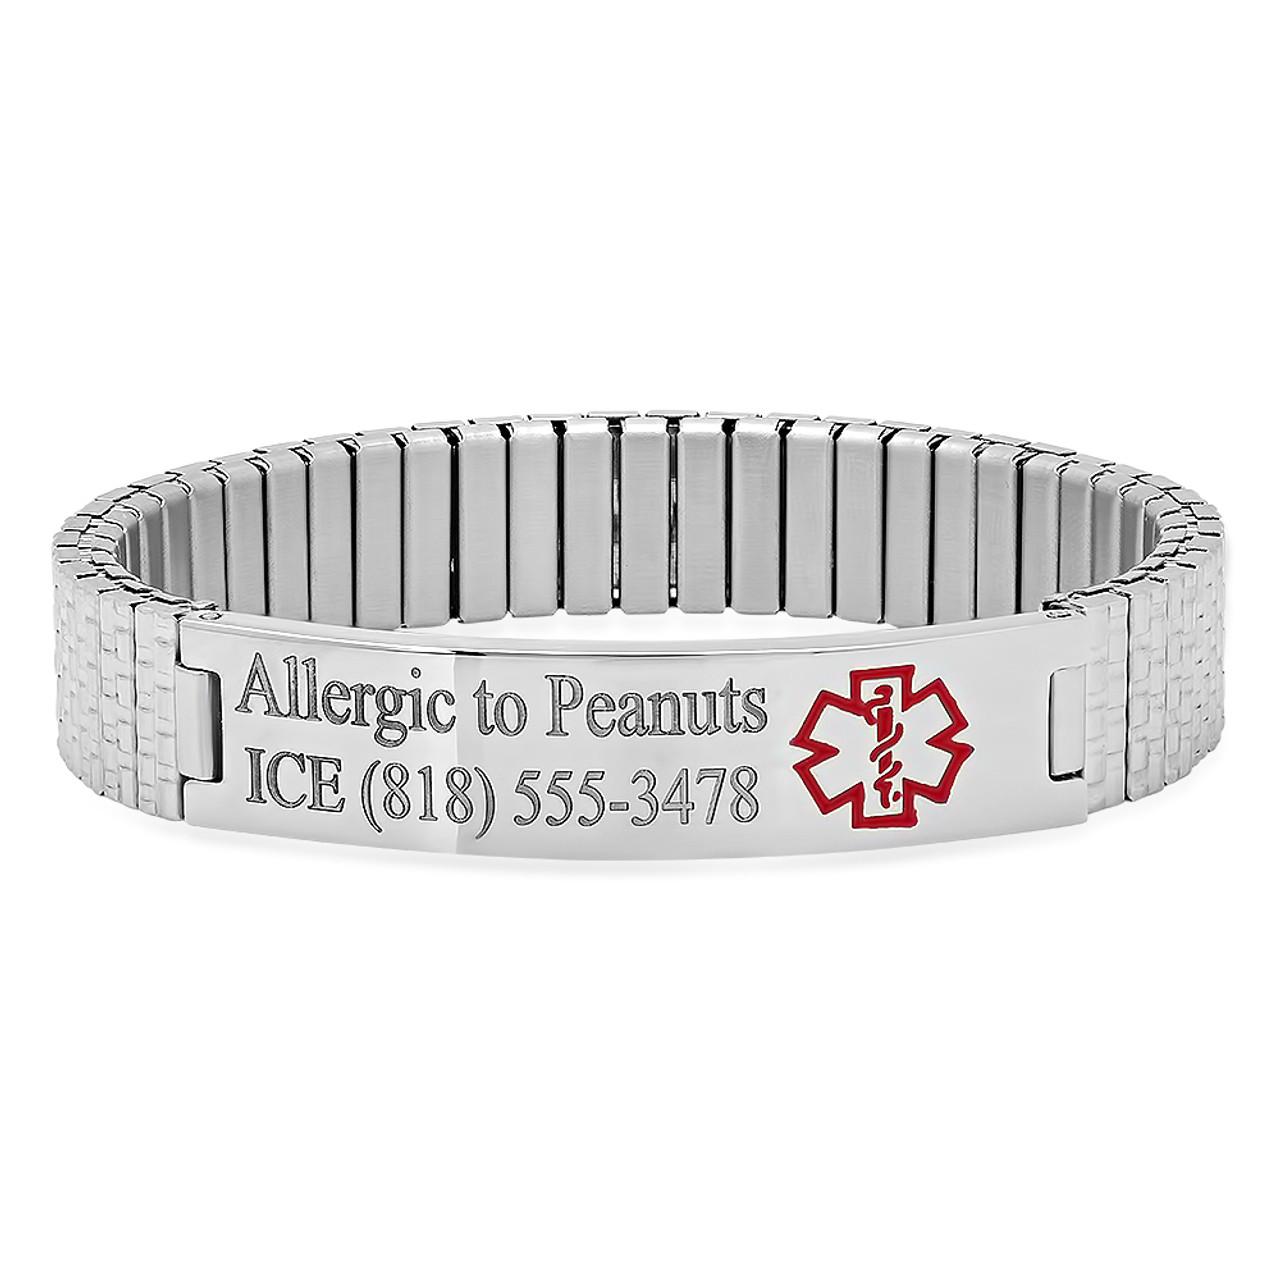 Graduating Class of 2019 Bracelet Men/'s Bracelet Name Bracelet STAINLESS STEEL ID Bracelet Personalized Bracelet Custom Engraved Bracelet